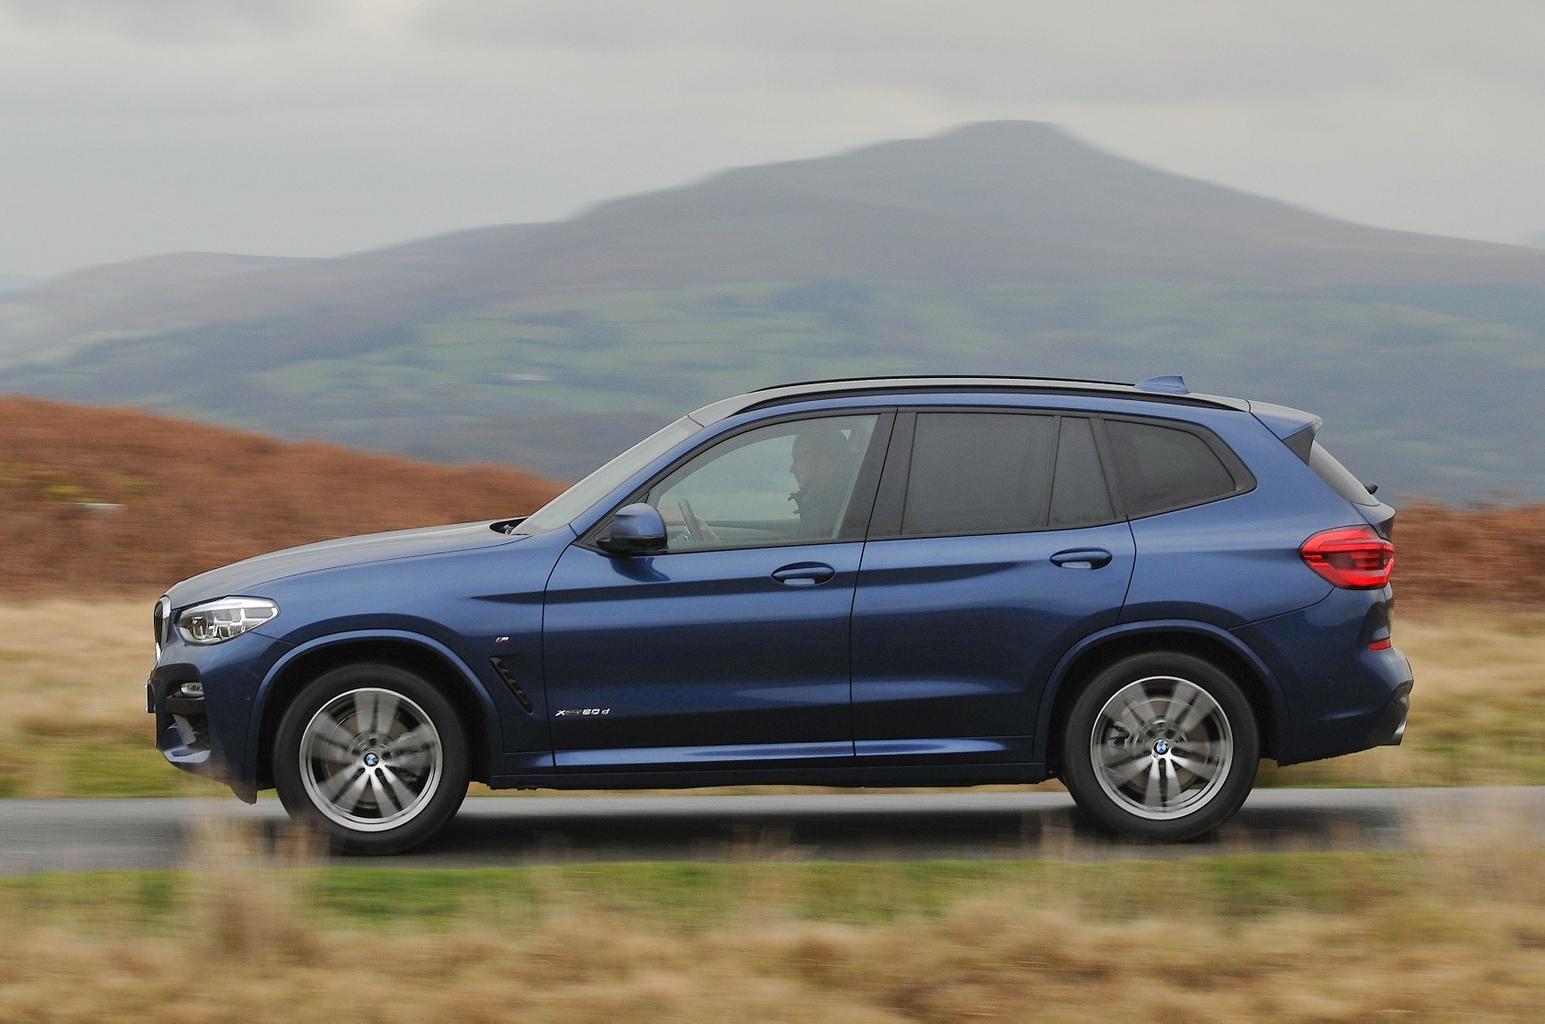 BMW X3 2021 left panning